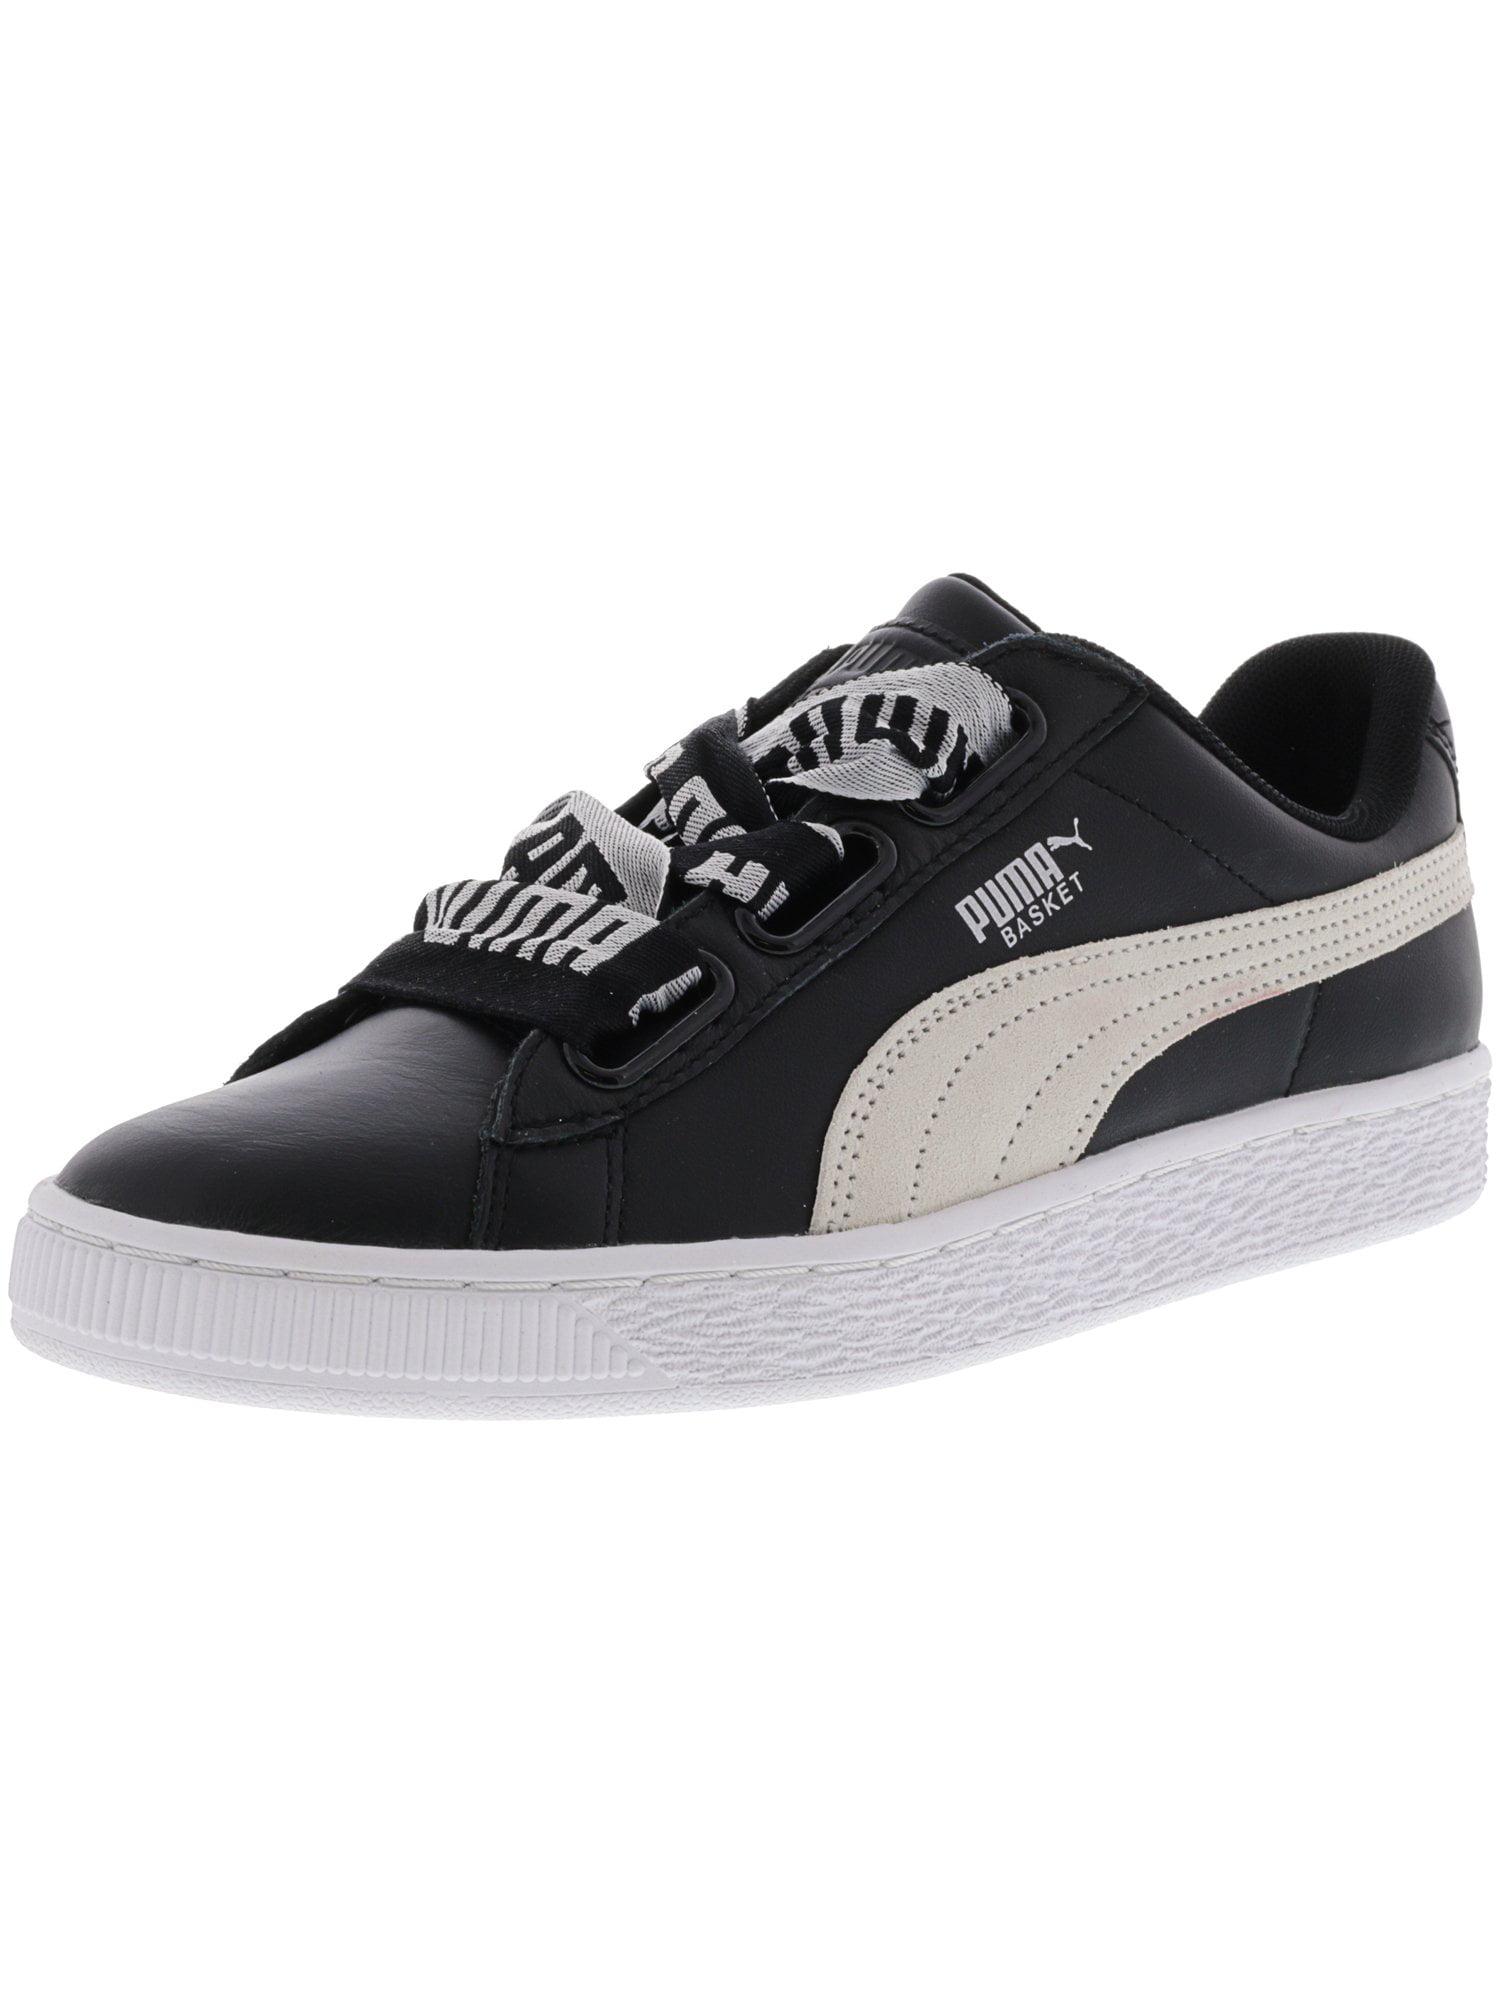 e305debdb5fb PUMA - Puma Women s Basket Heart De Black   White Leather Fashion Sneaker -  8M - Walmart.com